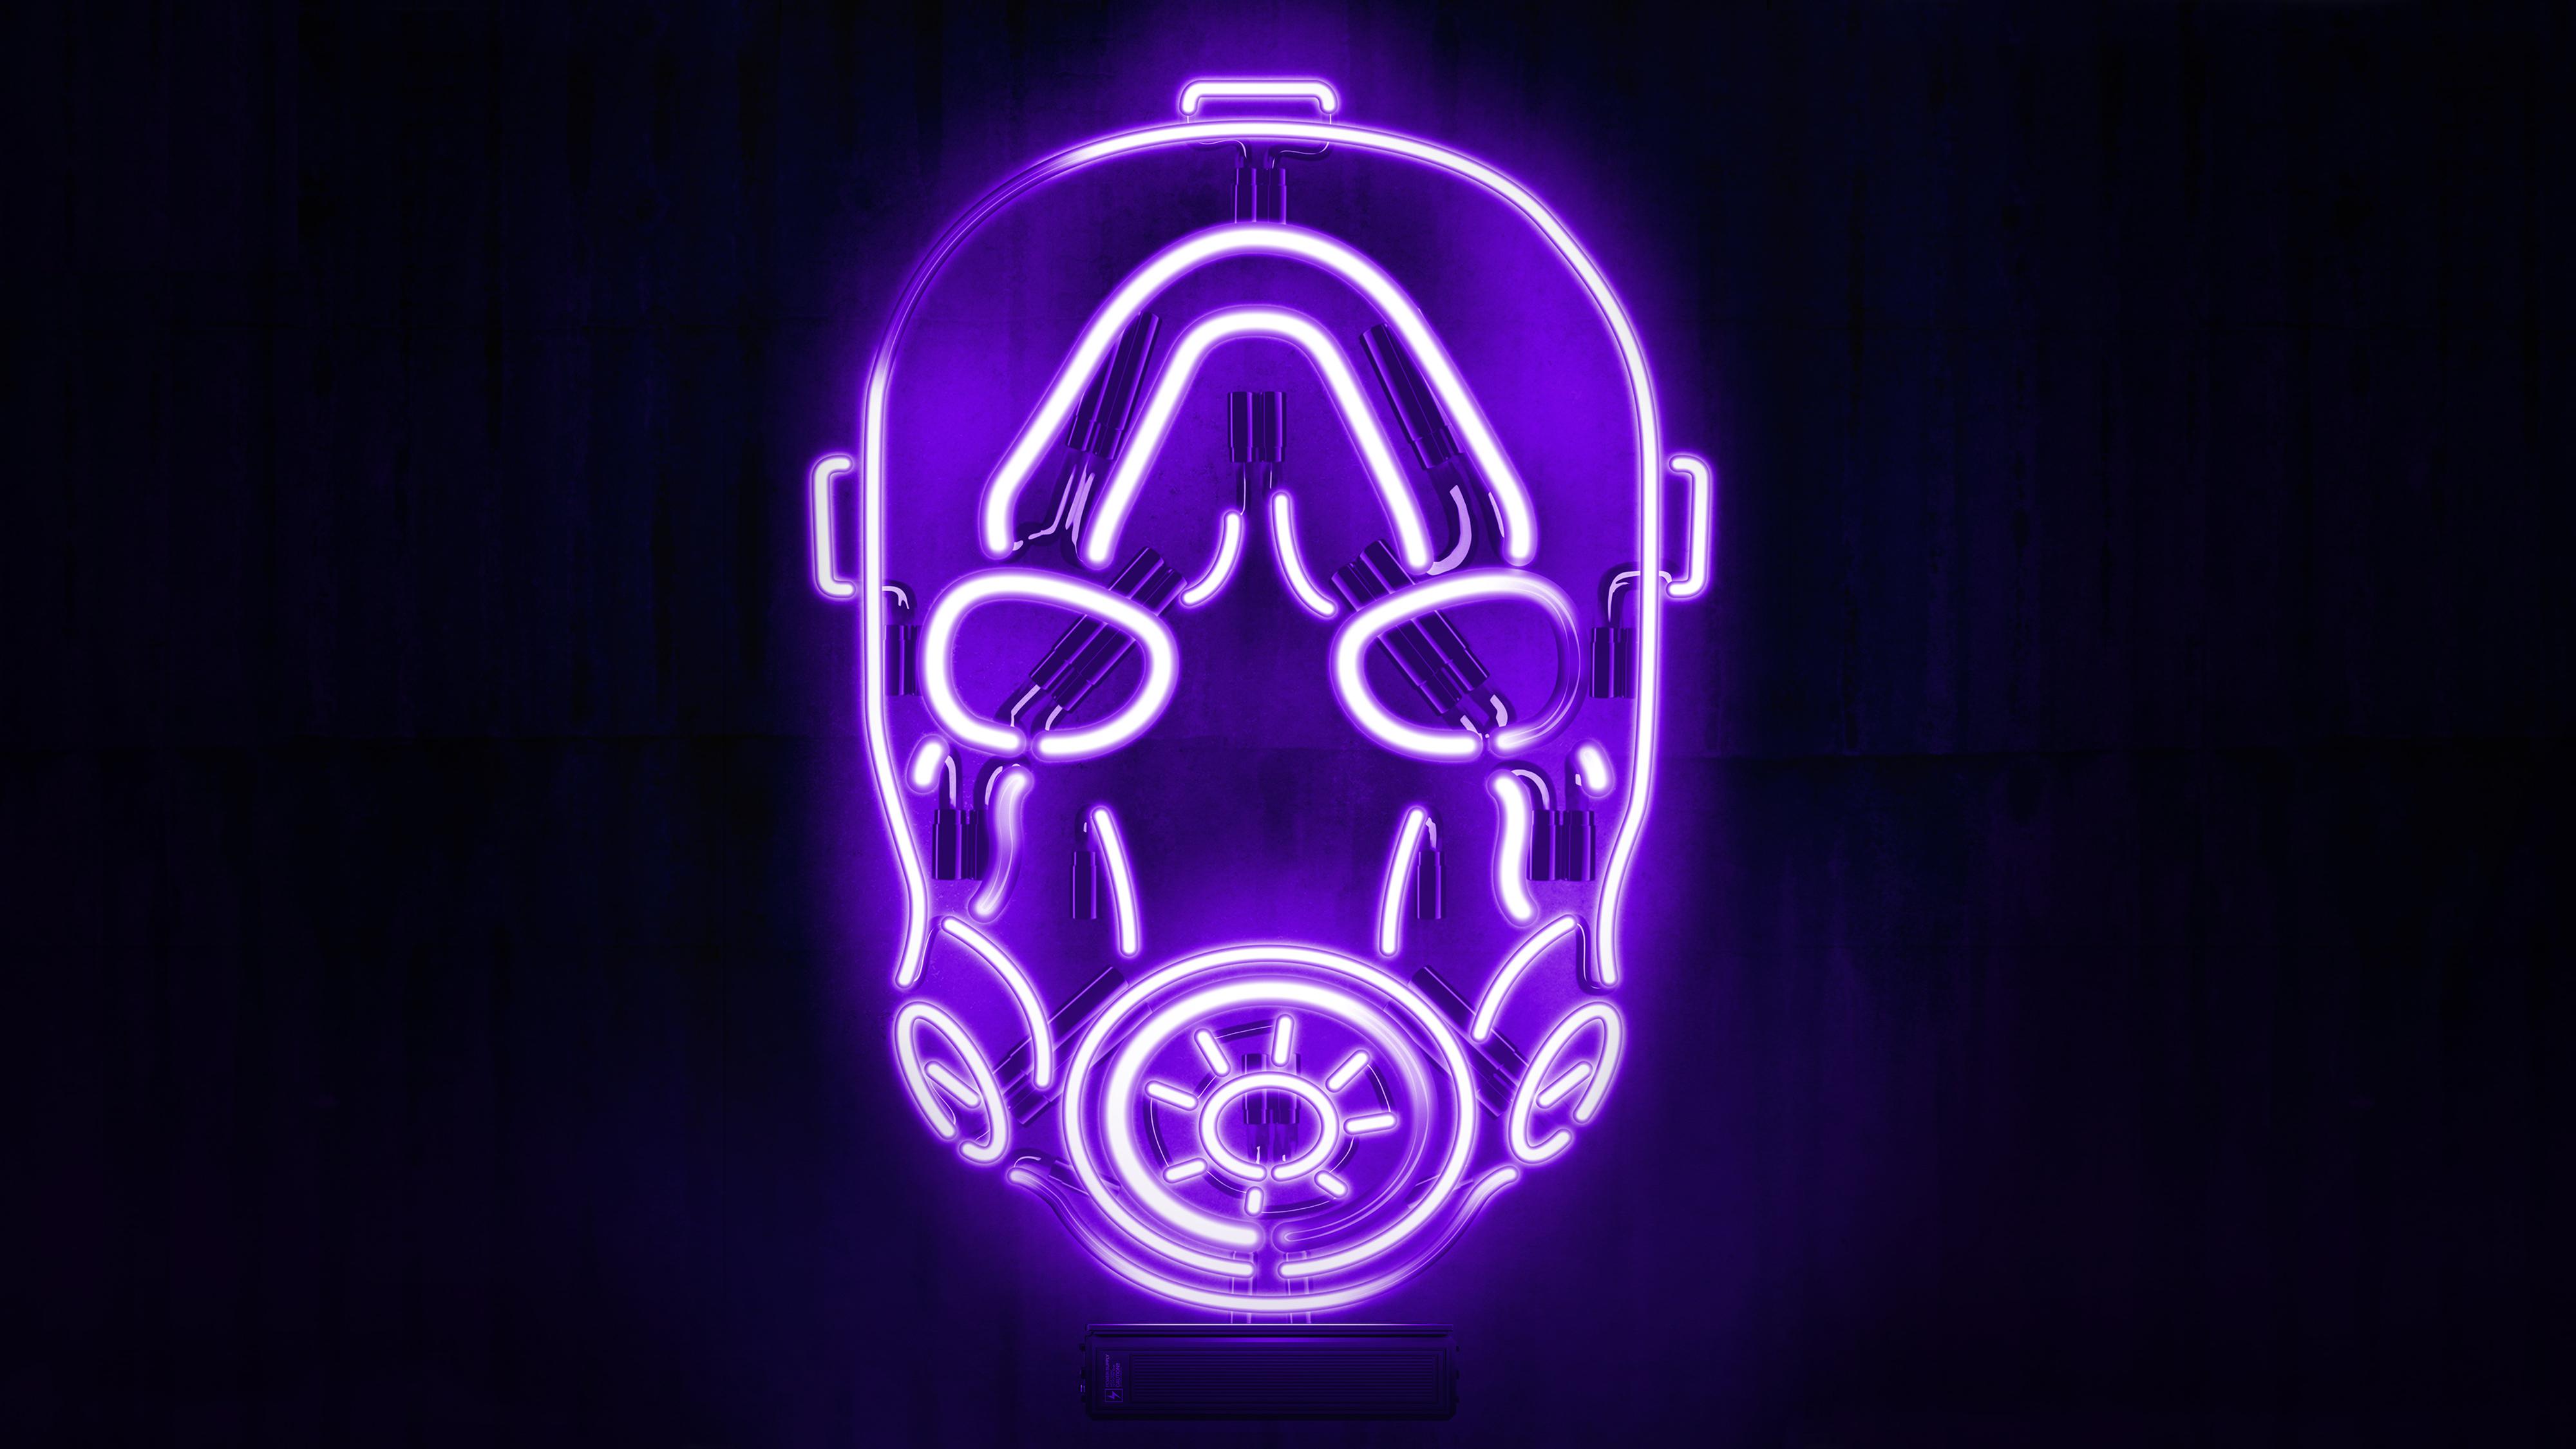 Neon Borderlands Mask Wallpaper Hd Games 4k Wallpapers